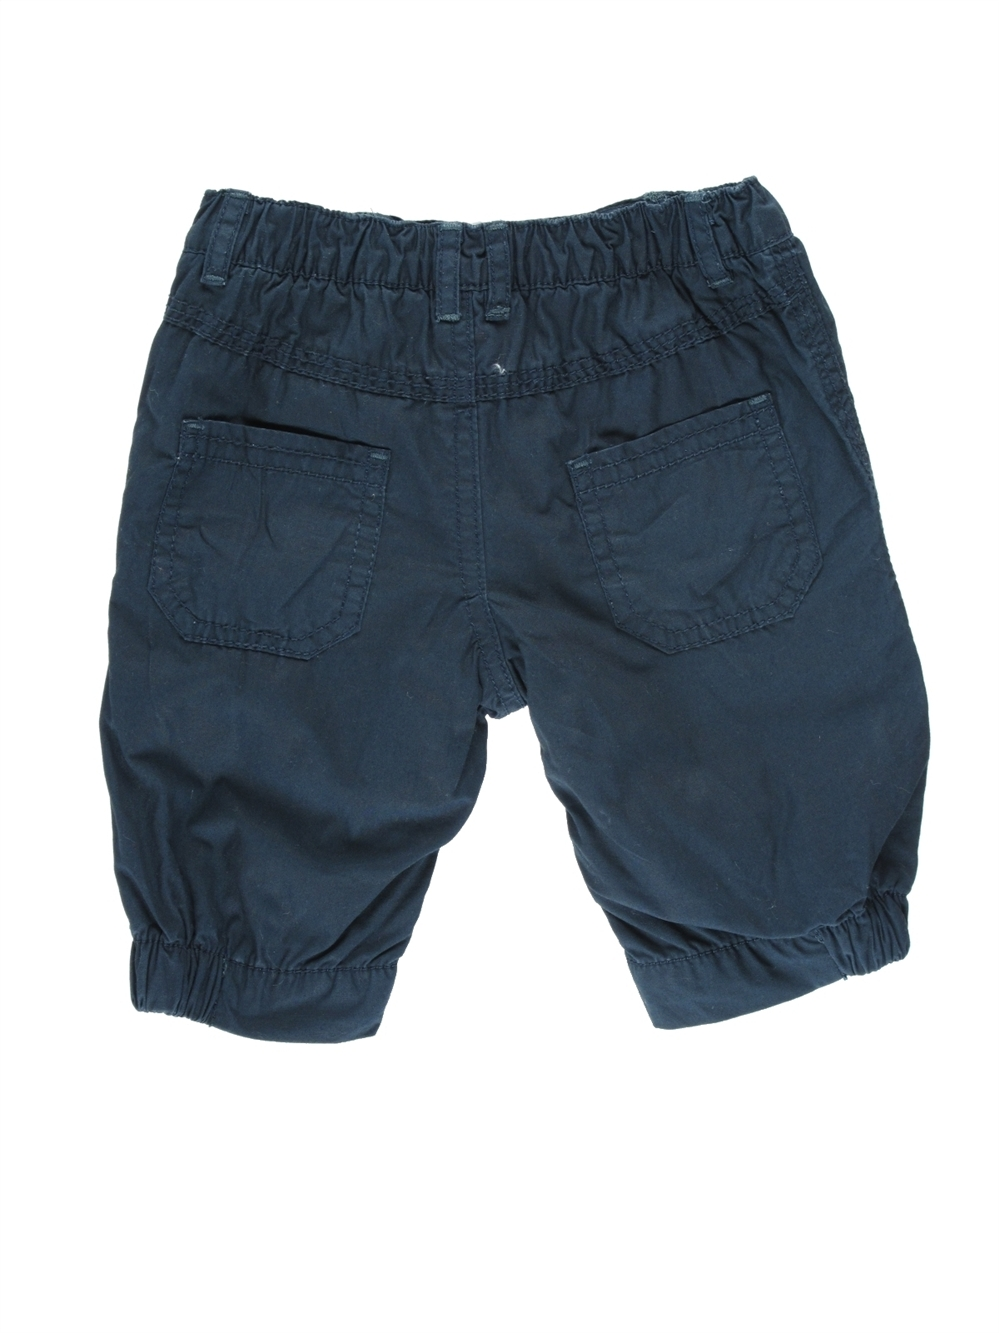 pantalon gar on kiabi 1 mois pas cher 342020. Black Bedroom Furniture Sets. Home Design Ideas